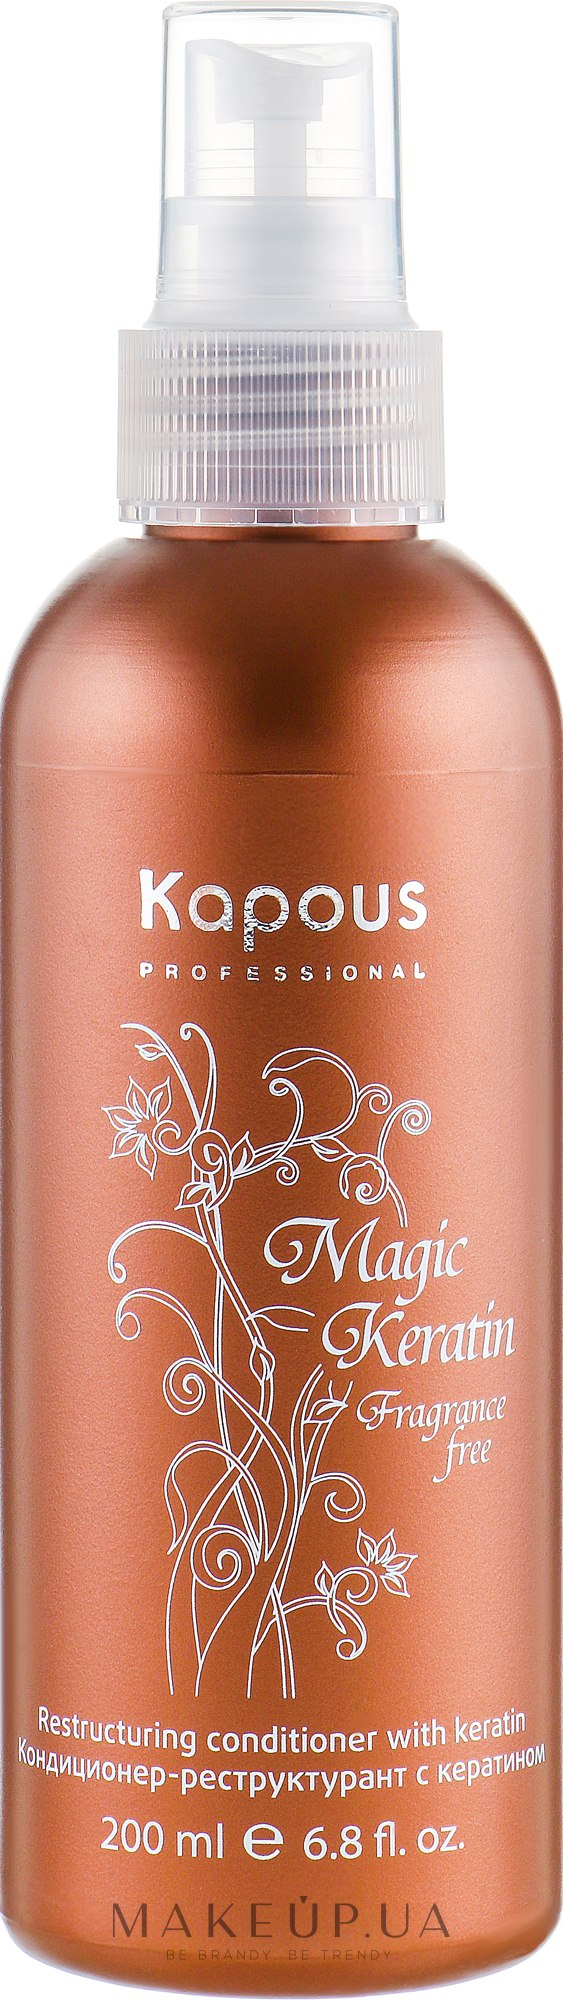 Кондиционер-реструктурант с кератином - Kapous Professional Air-Restrukturant Keratin Magic Keratin — фото 200ml